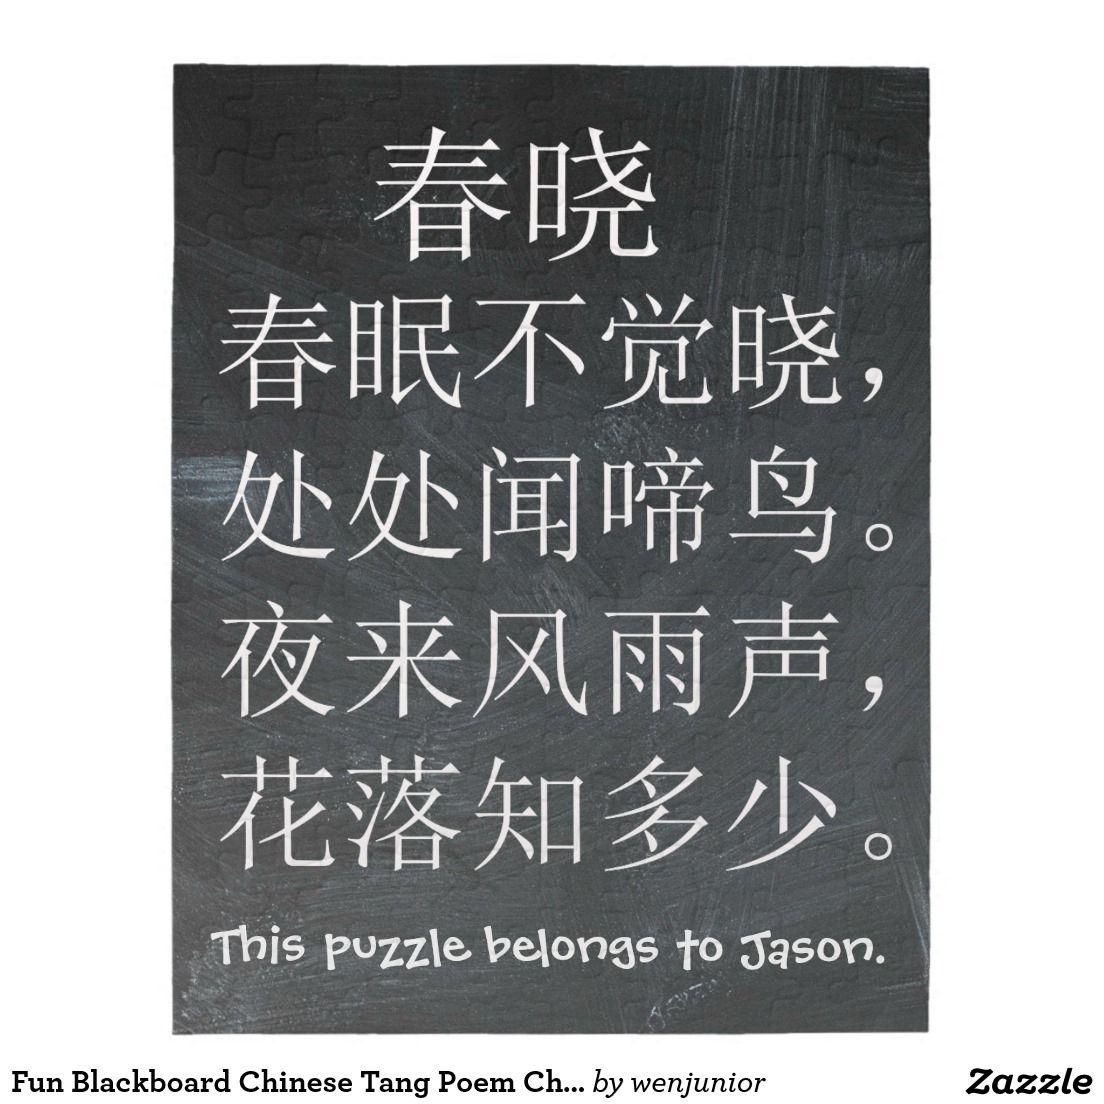 Fun Blackboard Chinese Tang Poem Chinese Character Jigsaw ...